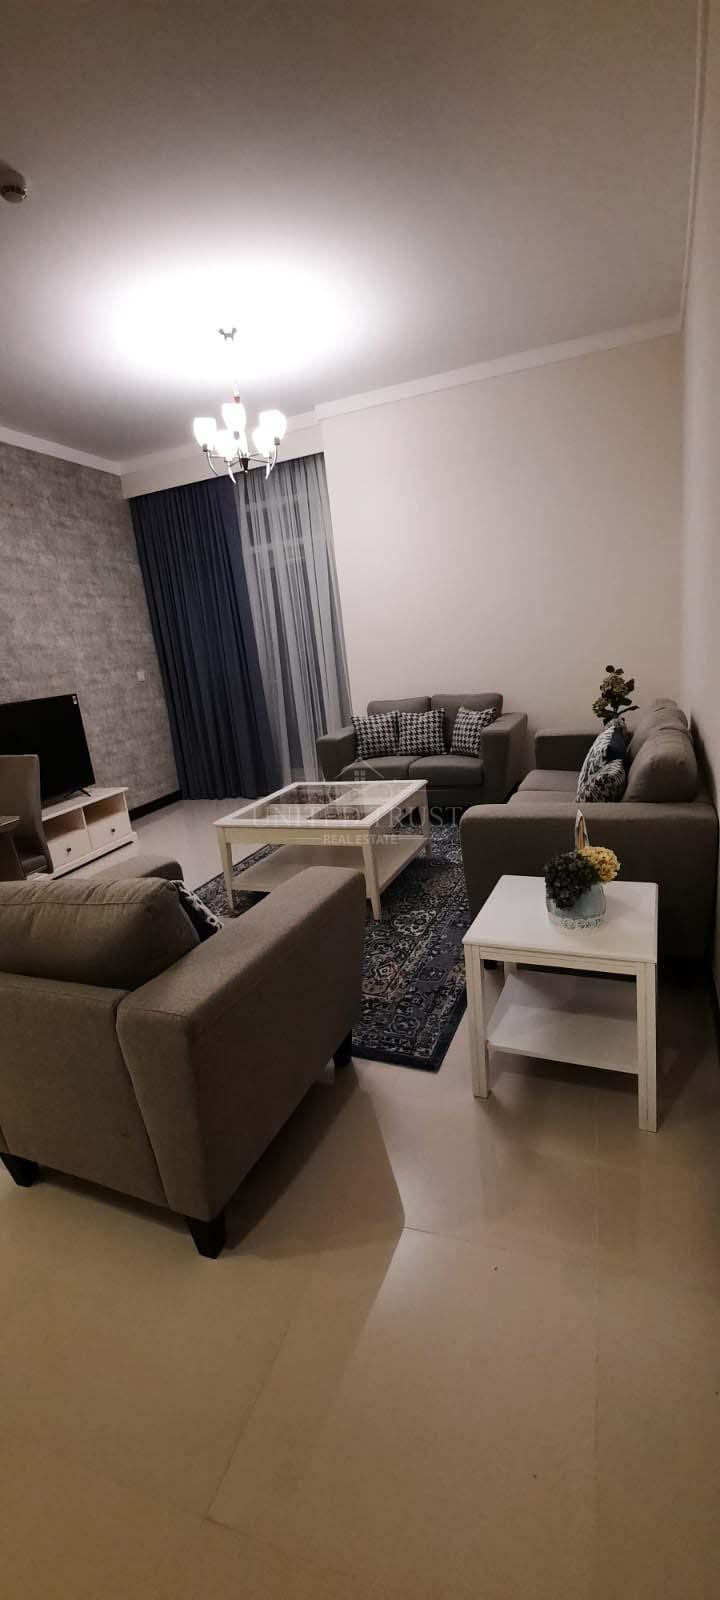 For Rent Apartment In Juffair Ref: JUF-SB-083